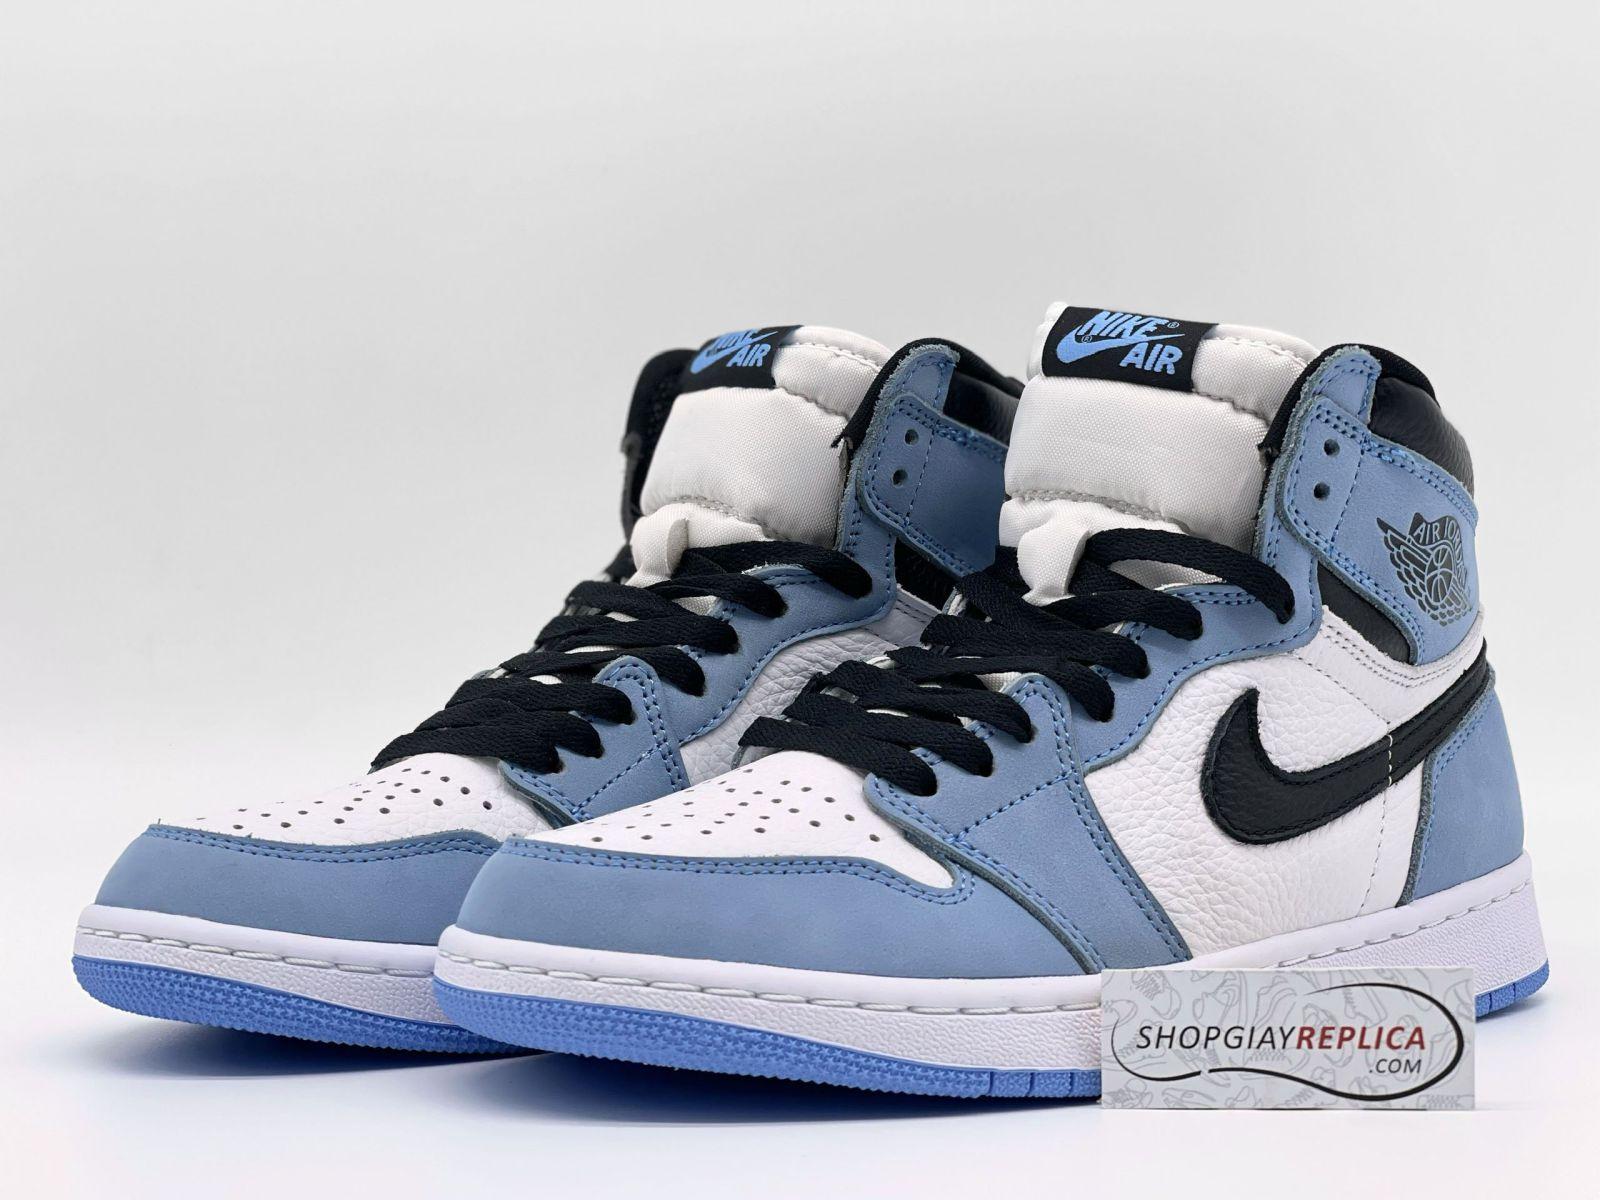 Giày Nike Jordan 1 High University Blue Like Auth